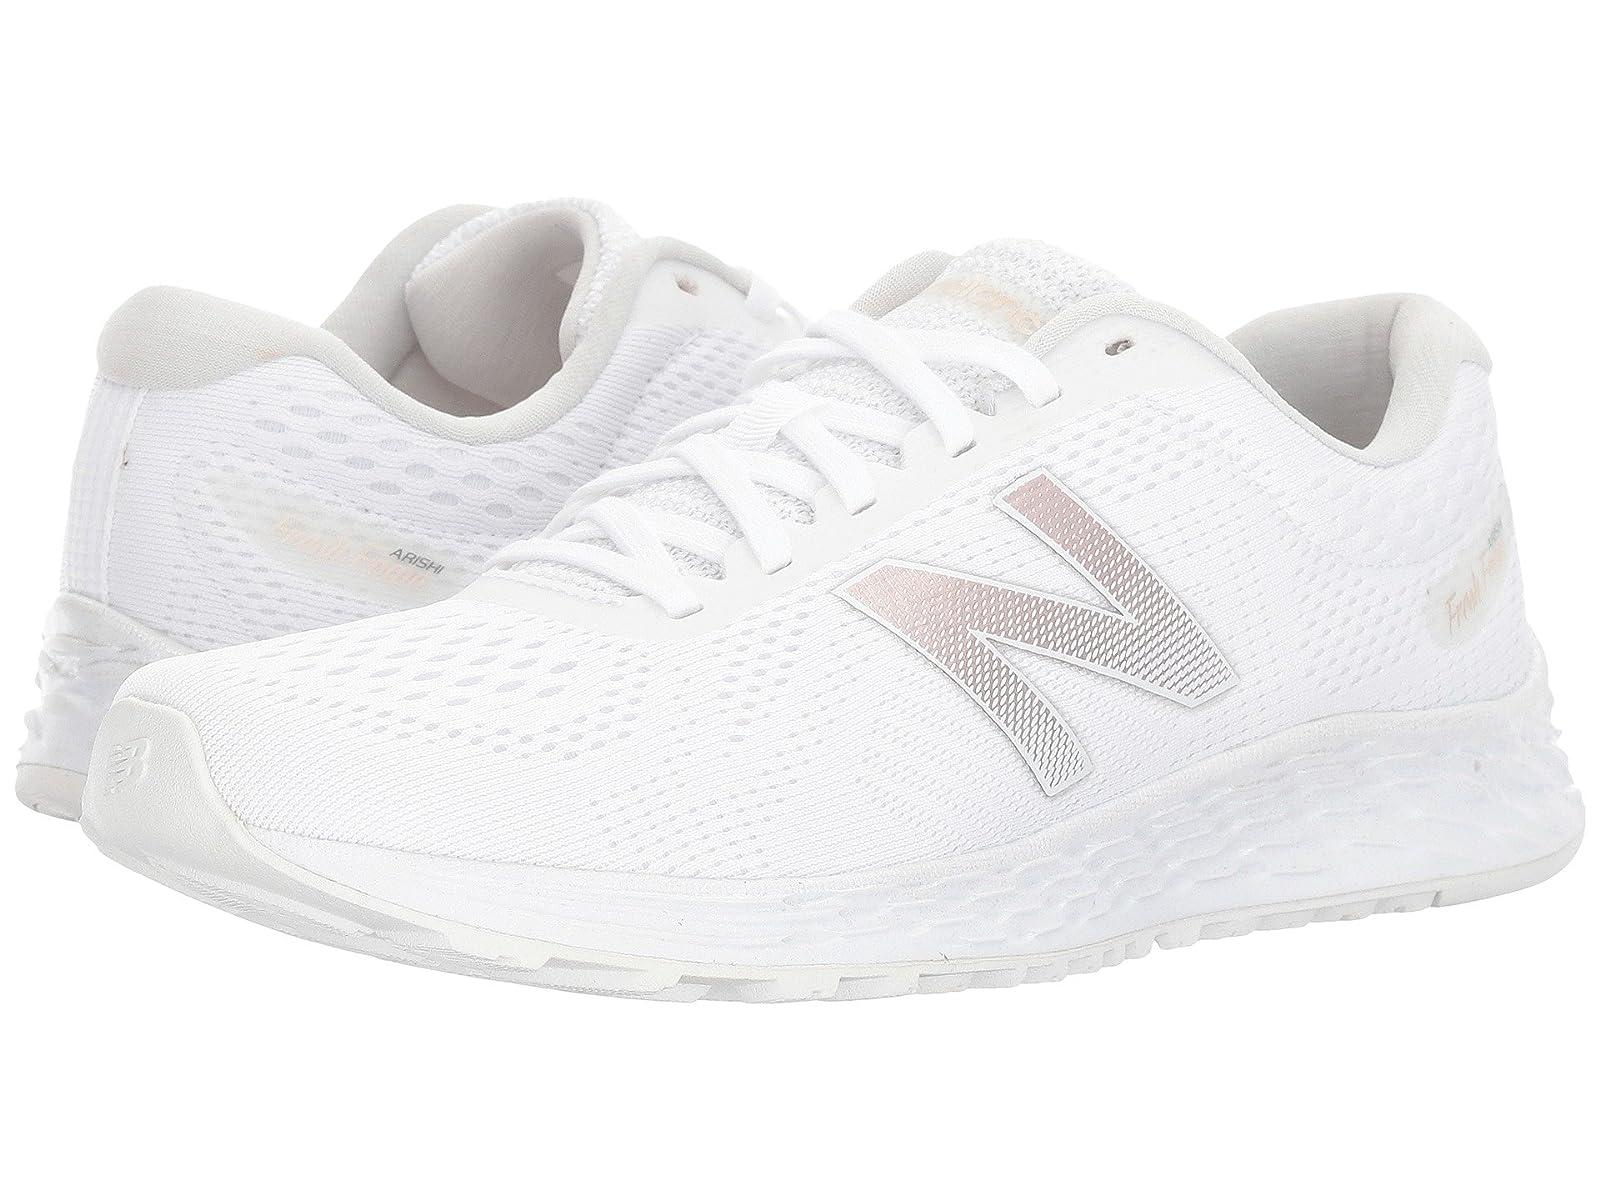 New Balance Arishi v1Cheap and distinctive eye-catching shoes